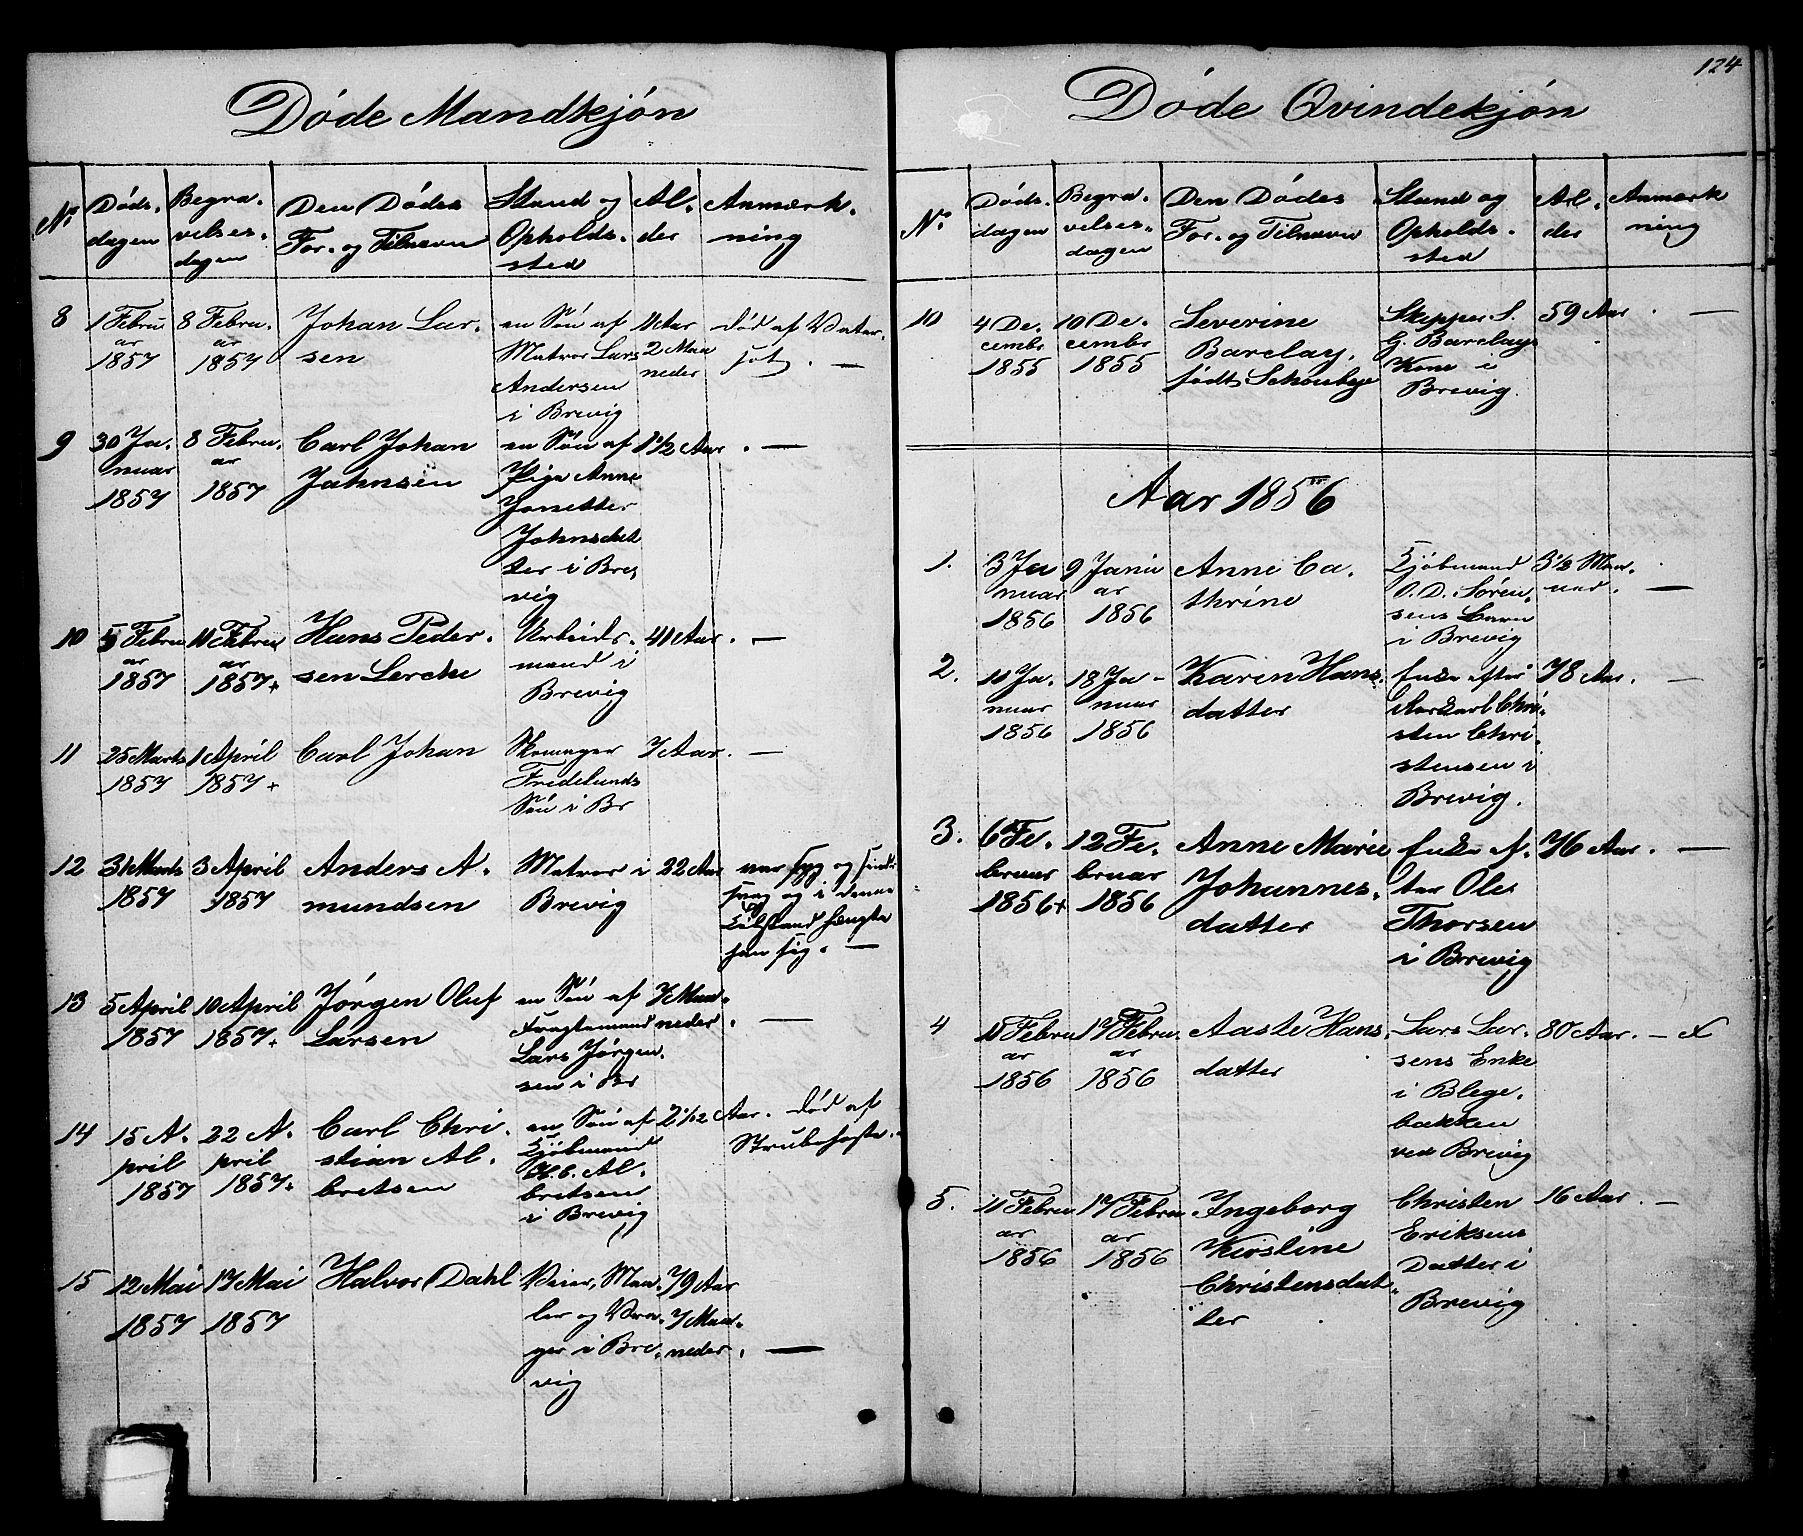 SAKO, Brevik kirkebøker, G/Ga/L0002: Klokkerbok nr. 2, 1846-1865, s. 124